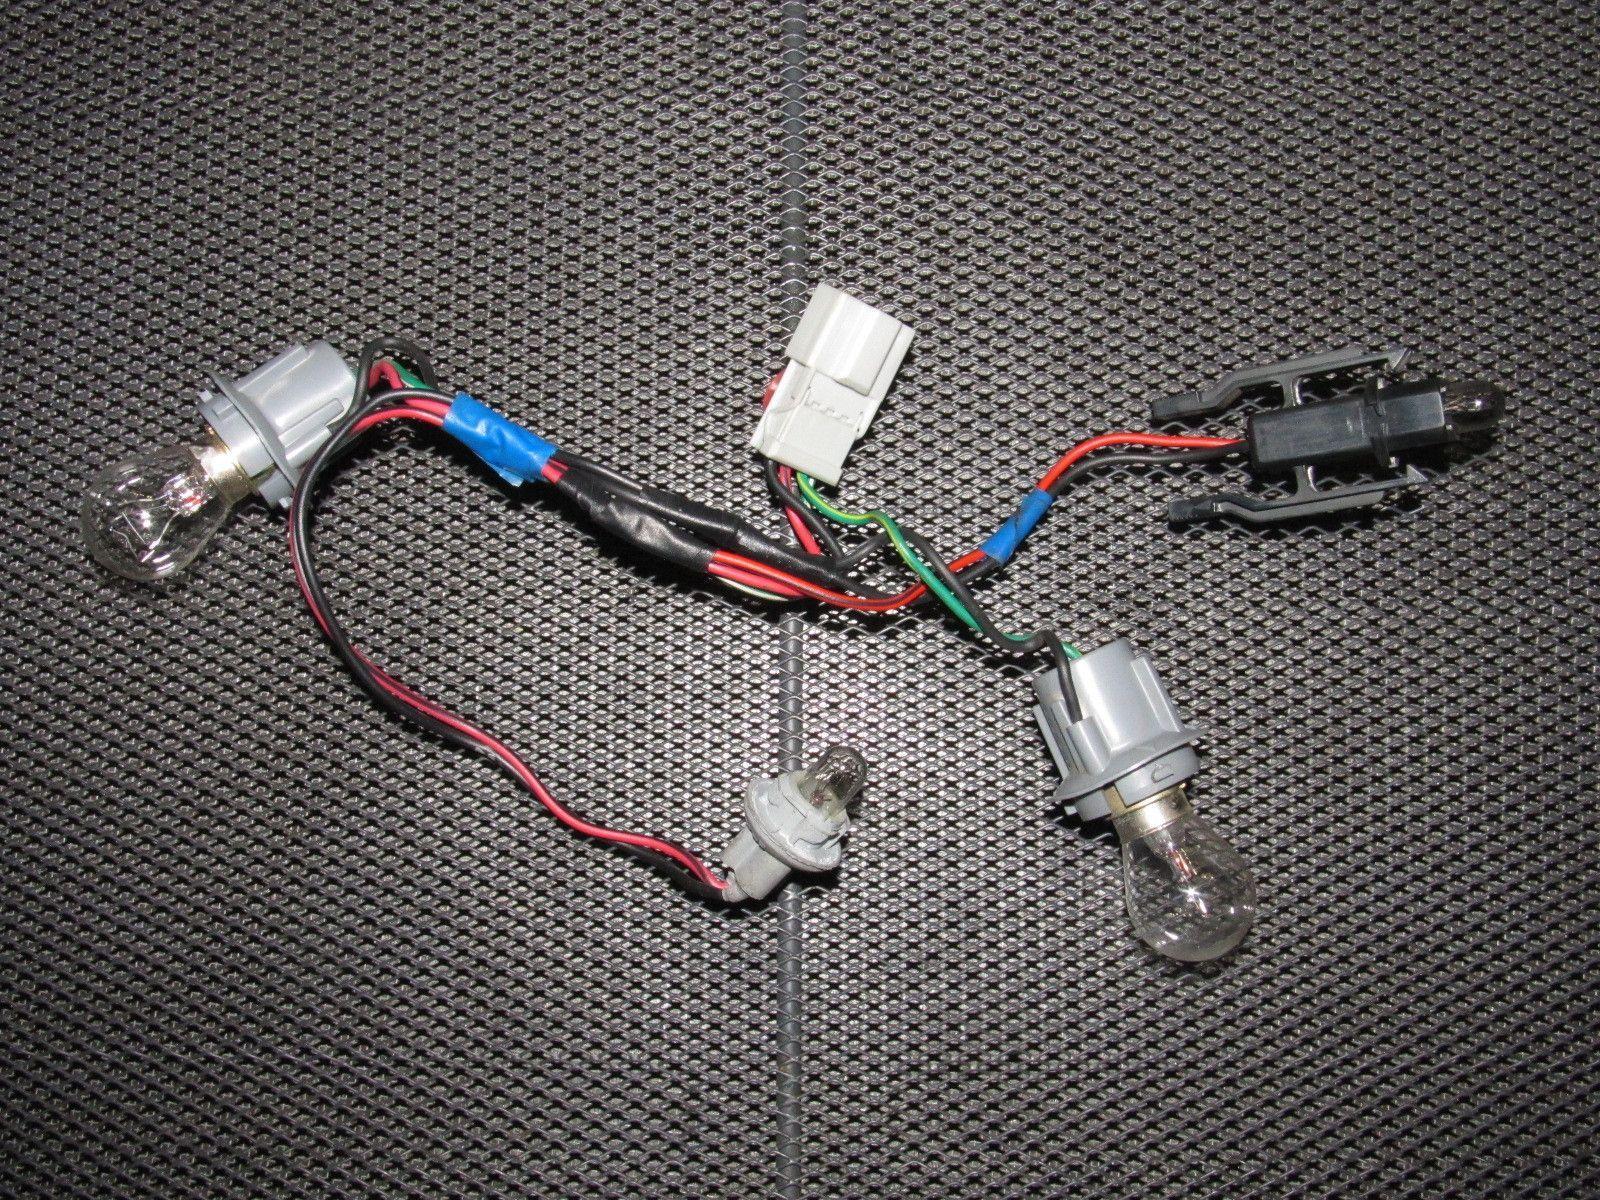 88 89 90 91 Honda Crx Oem Tail Light Bulb Socket Right 1990 Prelude Wiring